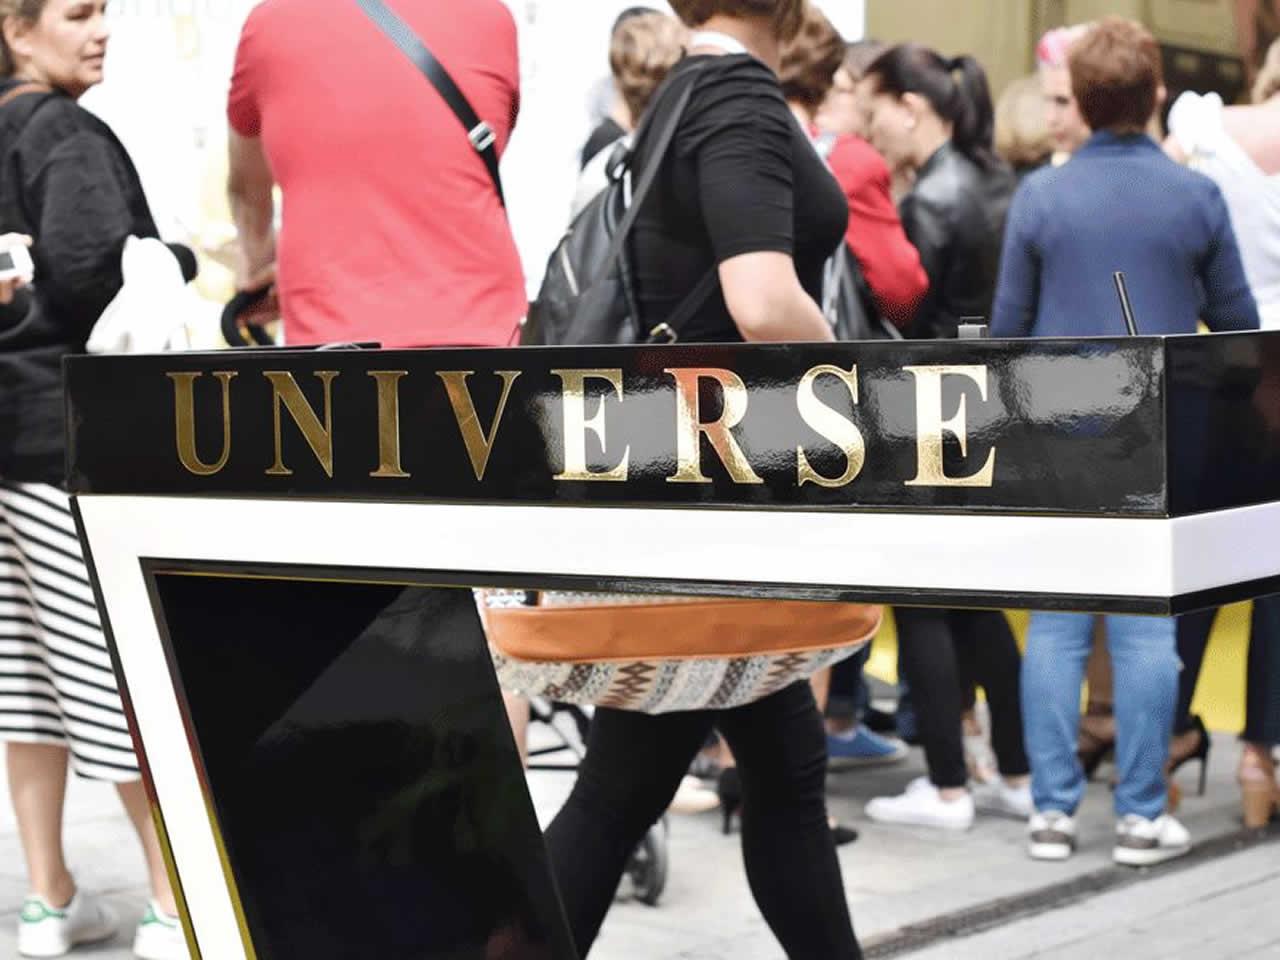 Organización de Inauguración de comercio Universe